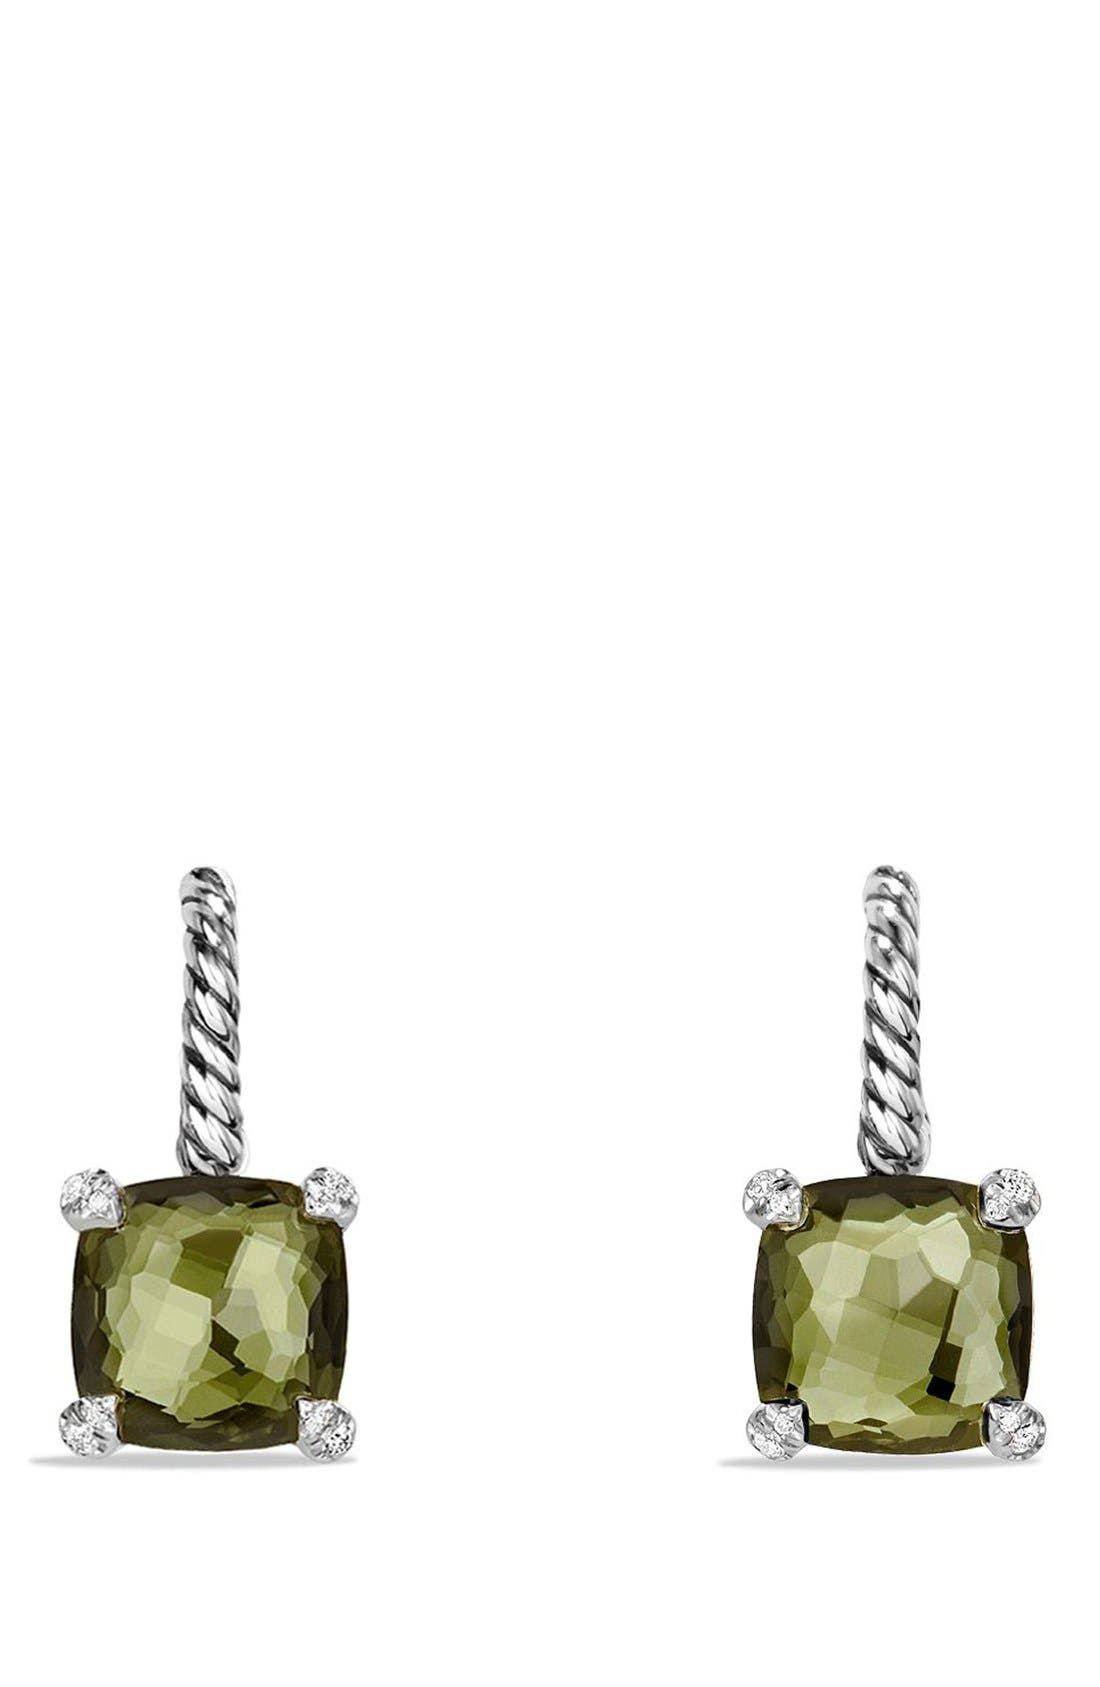 David Yurman 'Châtelaine' Drop Earrings with Semiprecious Stones and Diamonds